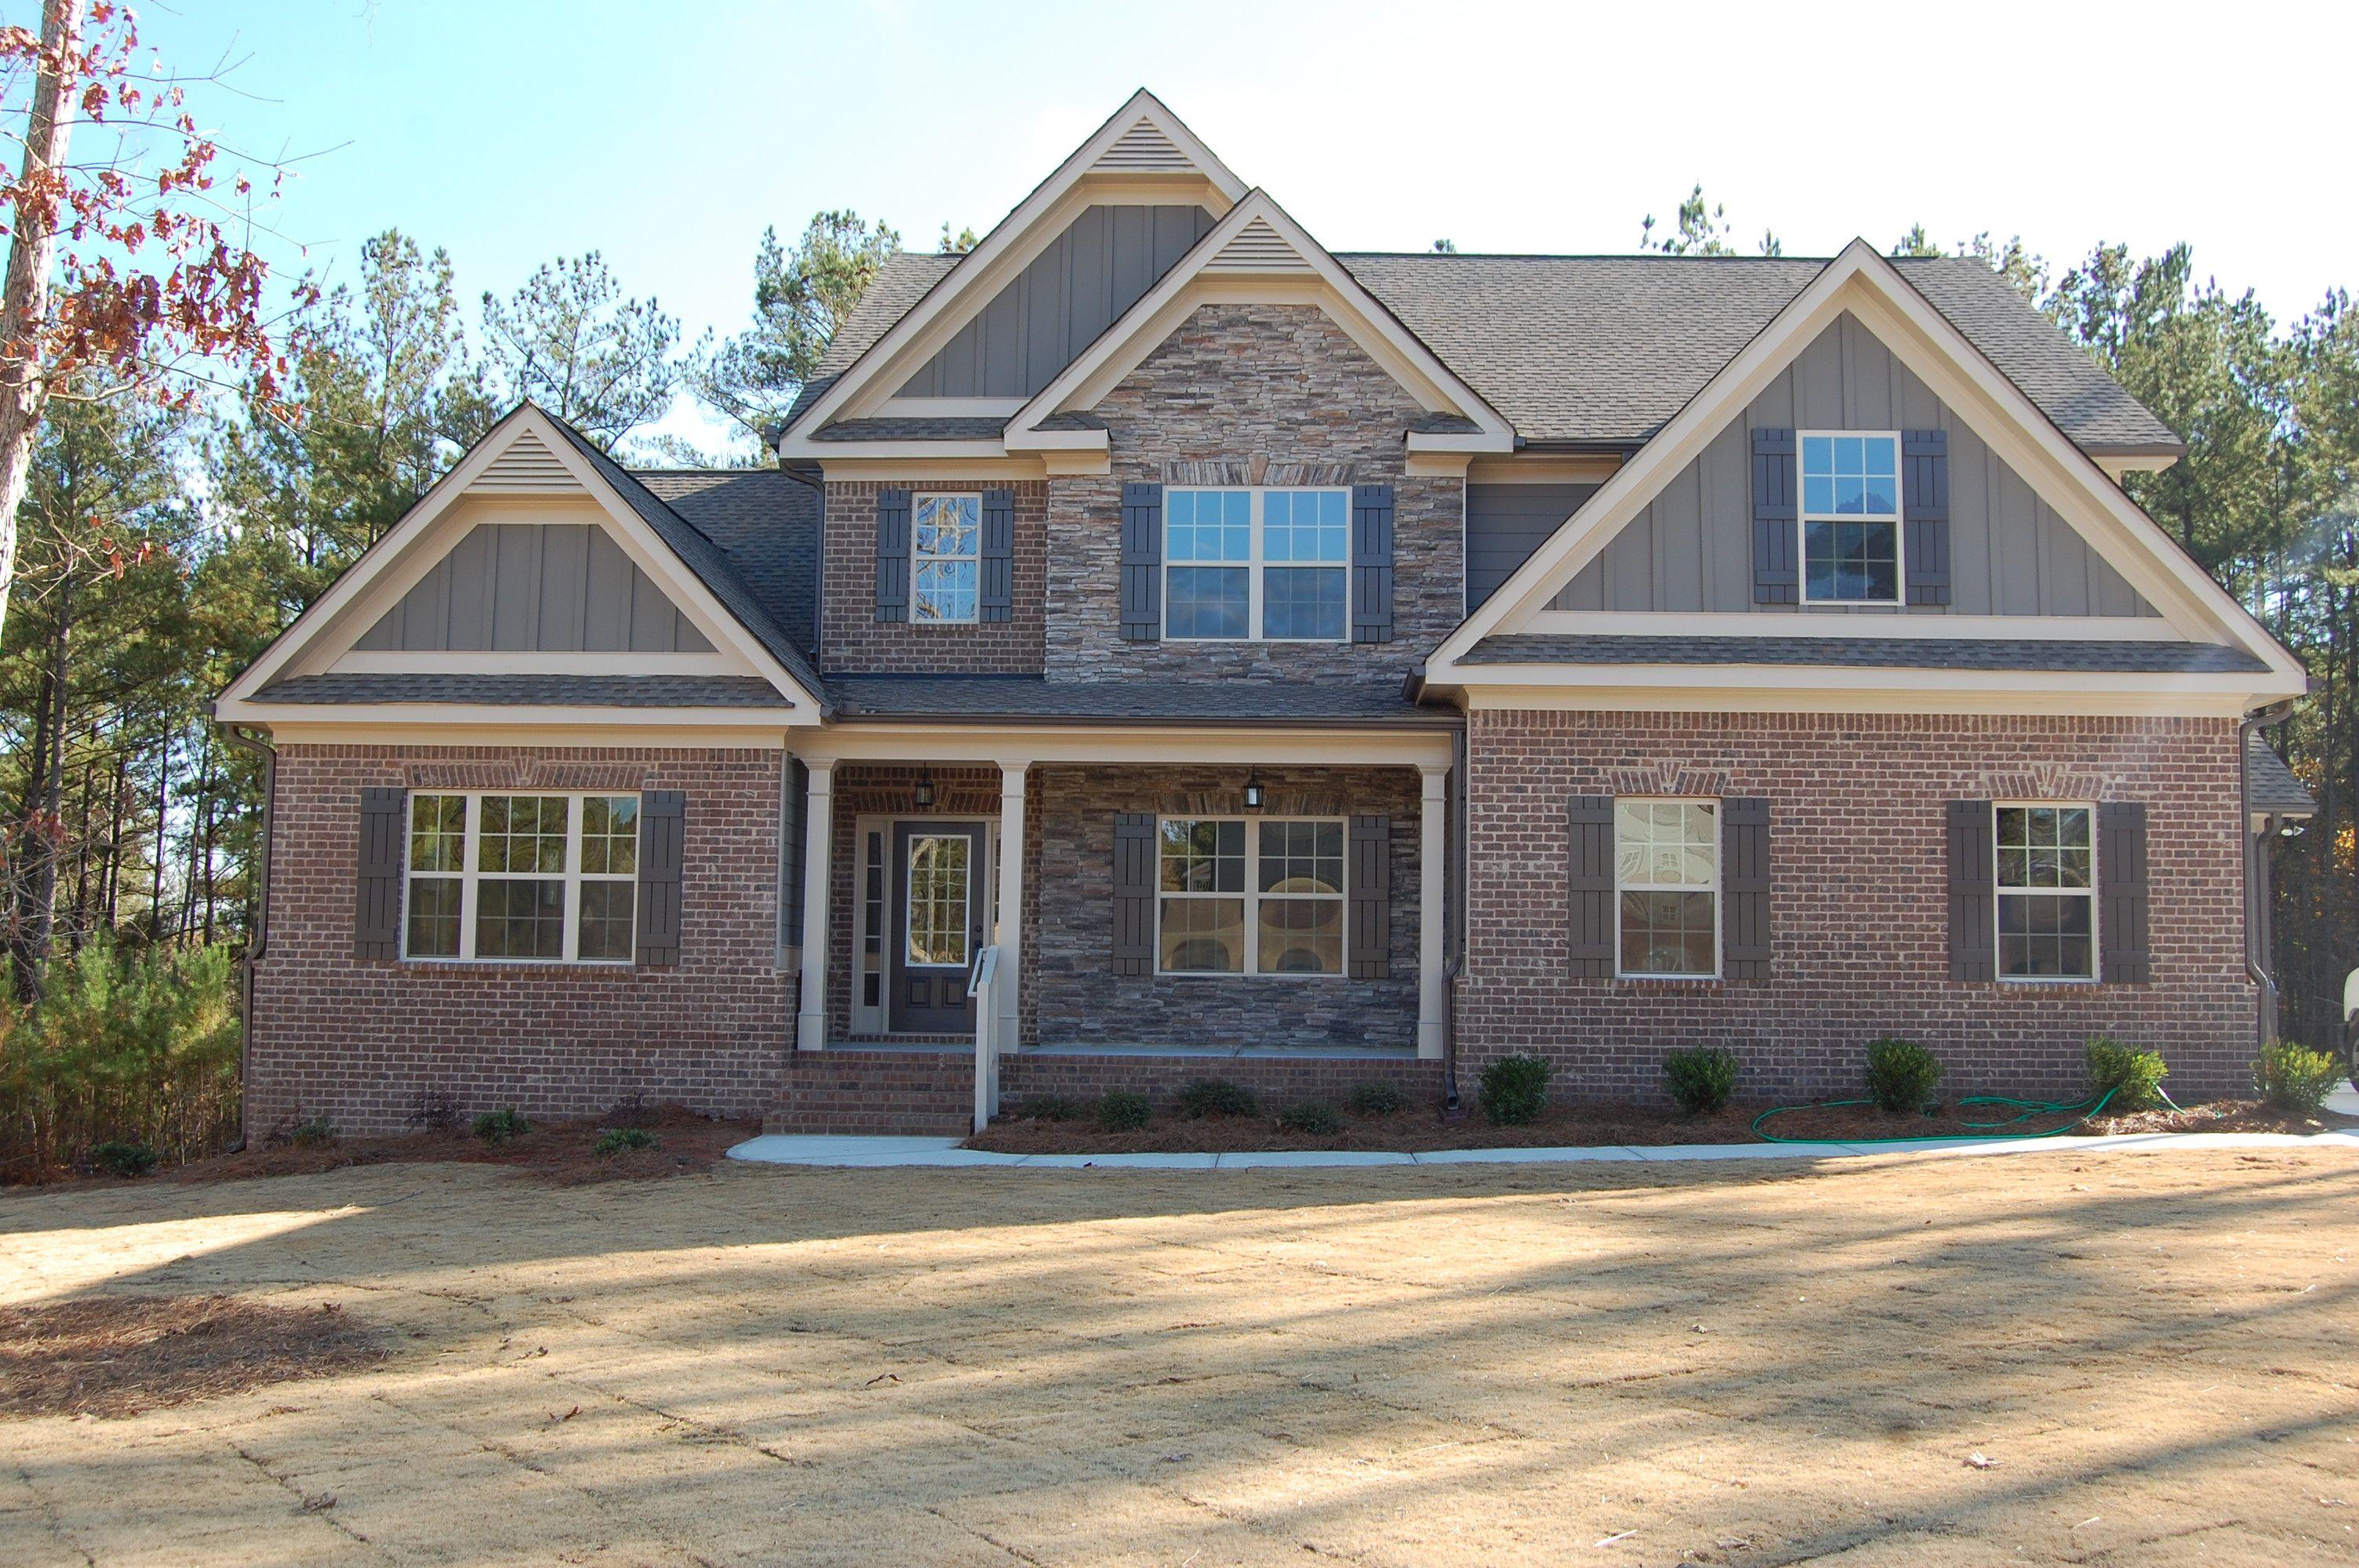 Home for Sale in Loganville GA Home for Sale in Walton